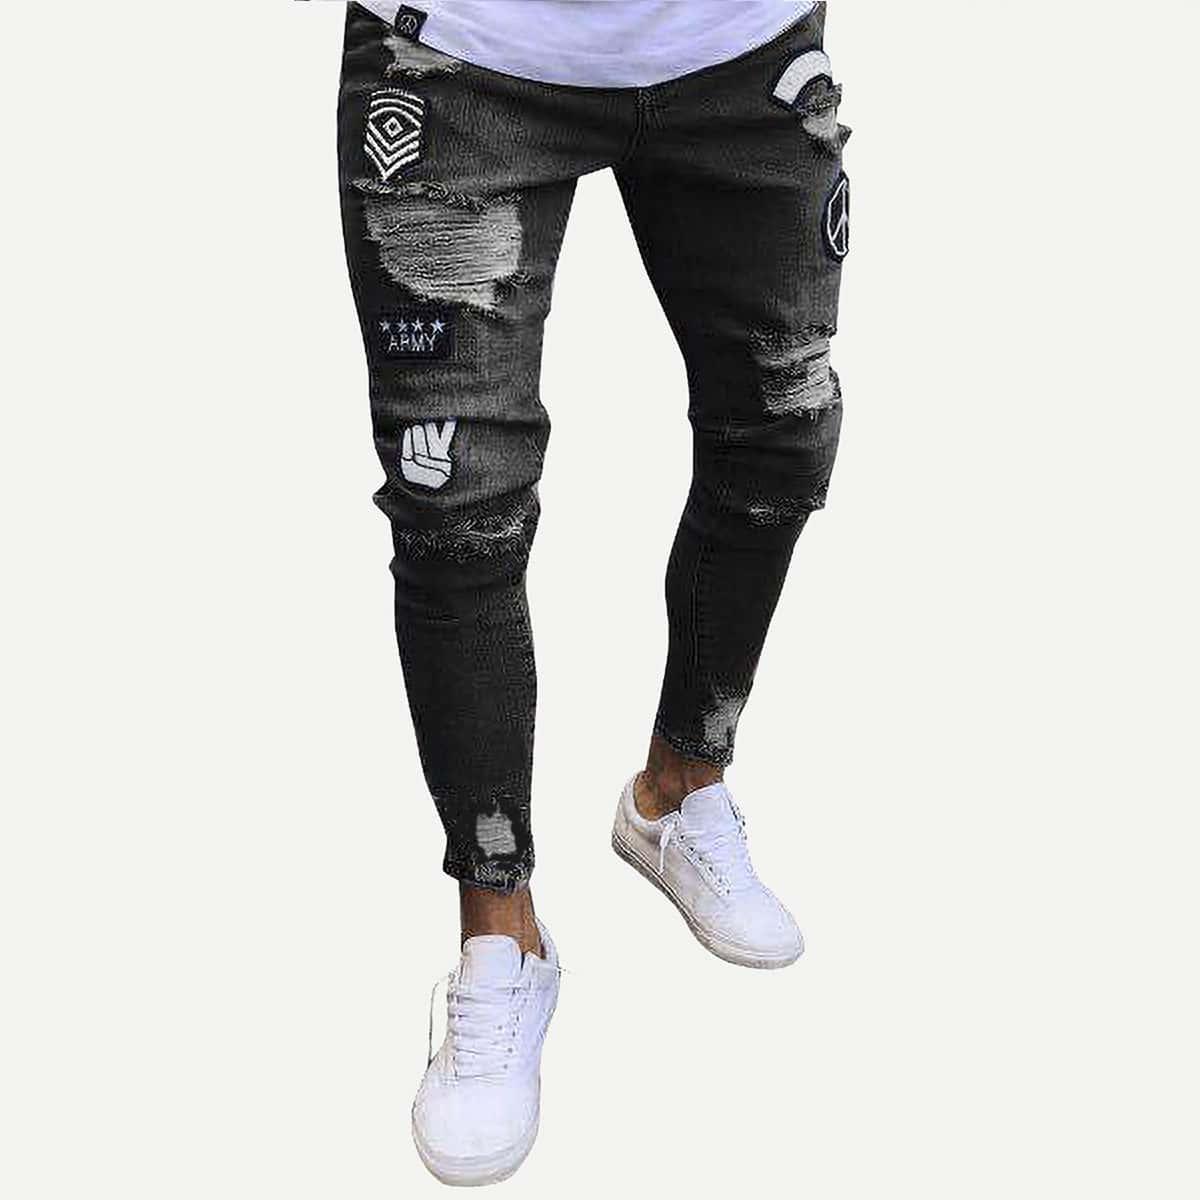 Zwart Casual Tekst Heren Jeans Patched